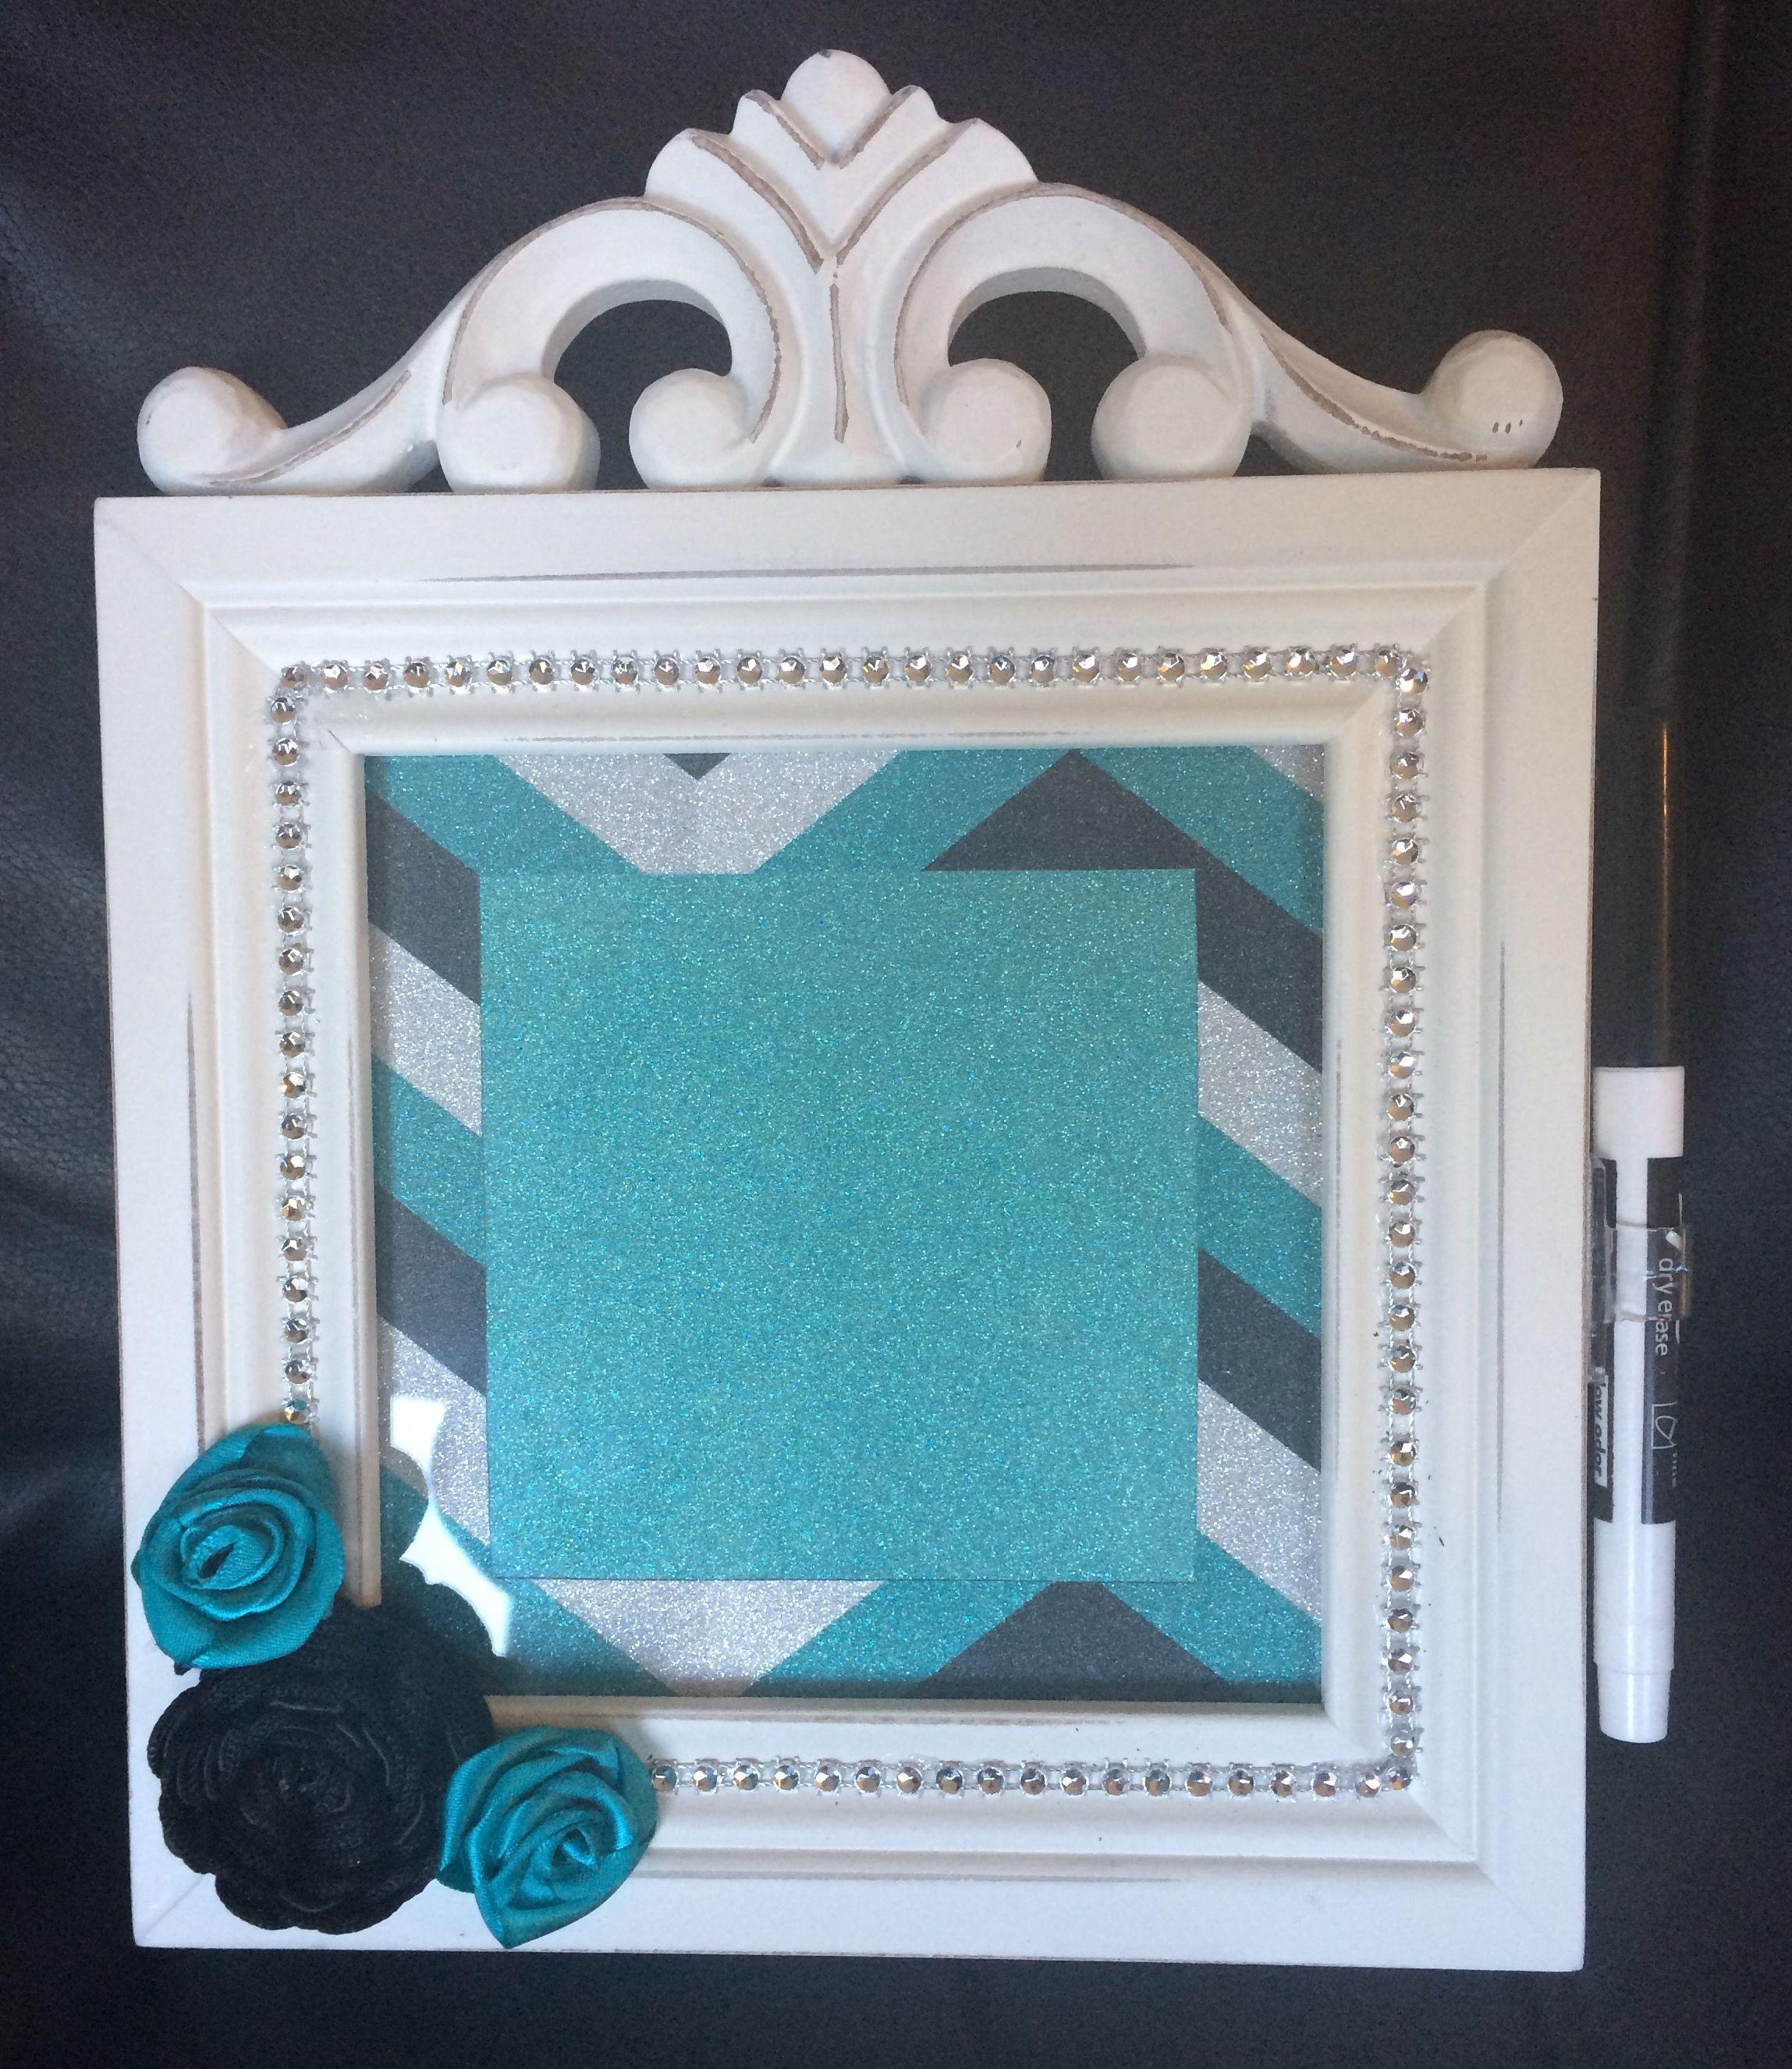 Dry erase frame. Used coordinating glitter paper, black